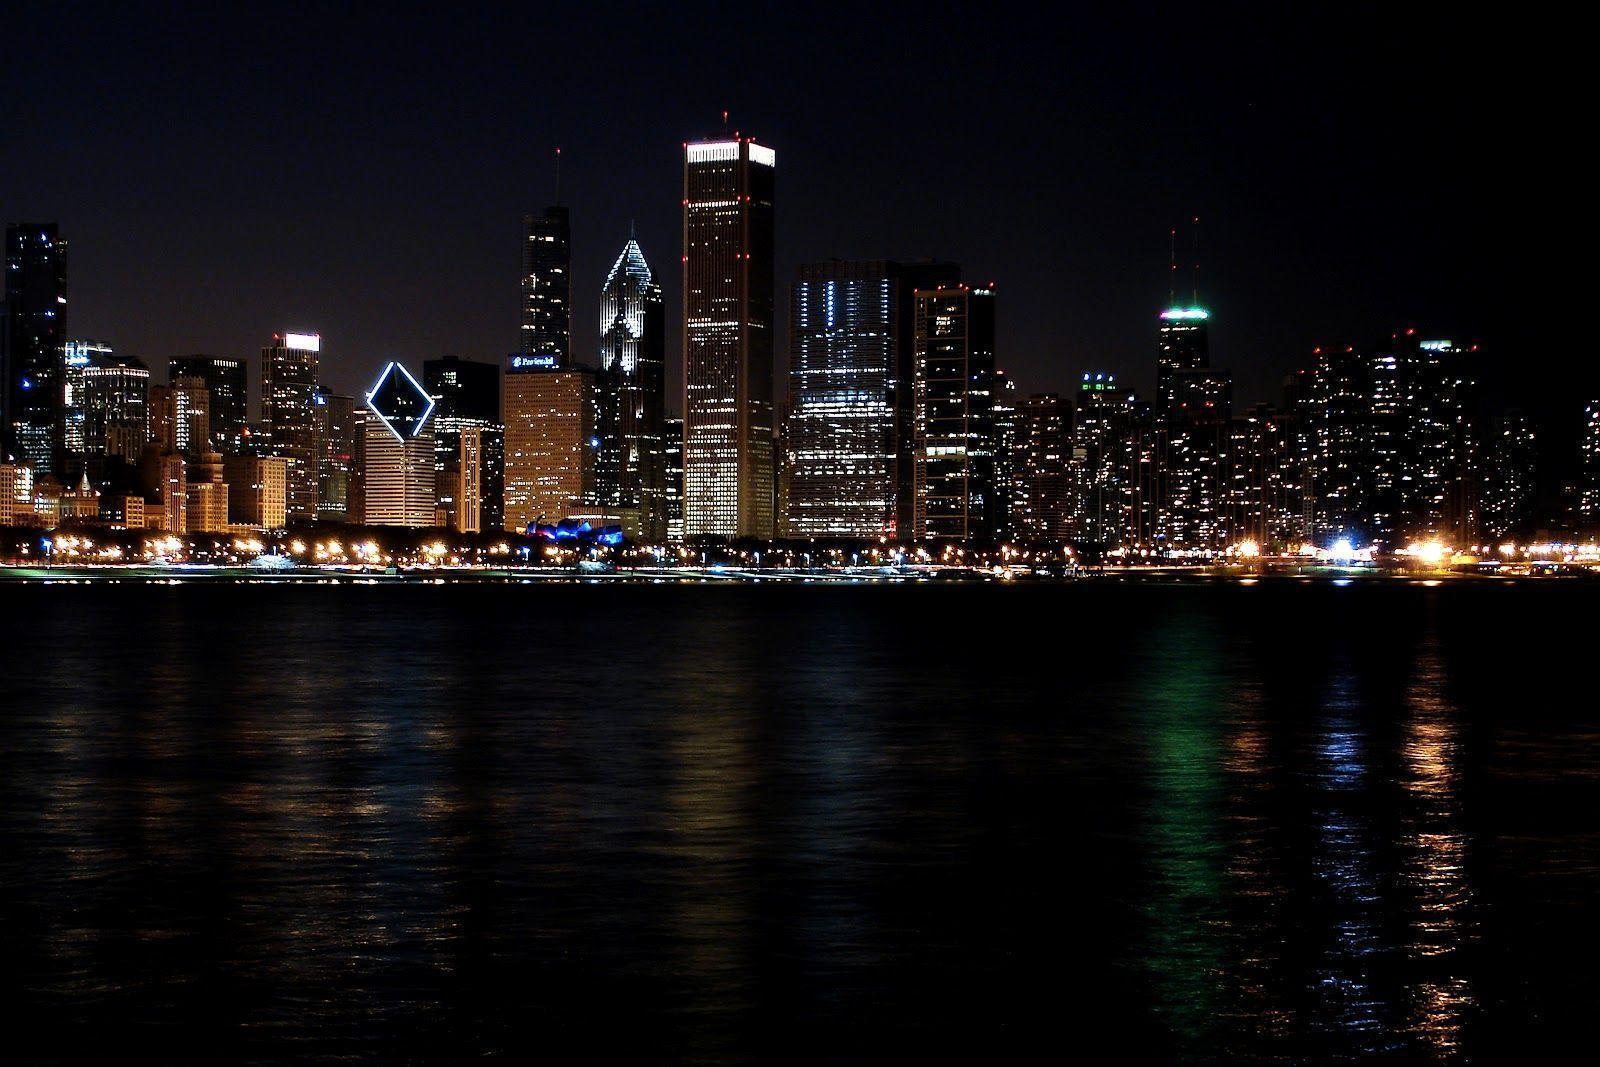 city night sky hd - photo #35